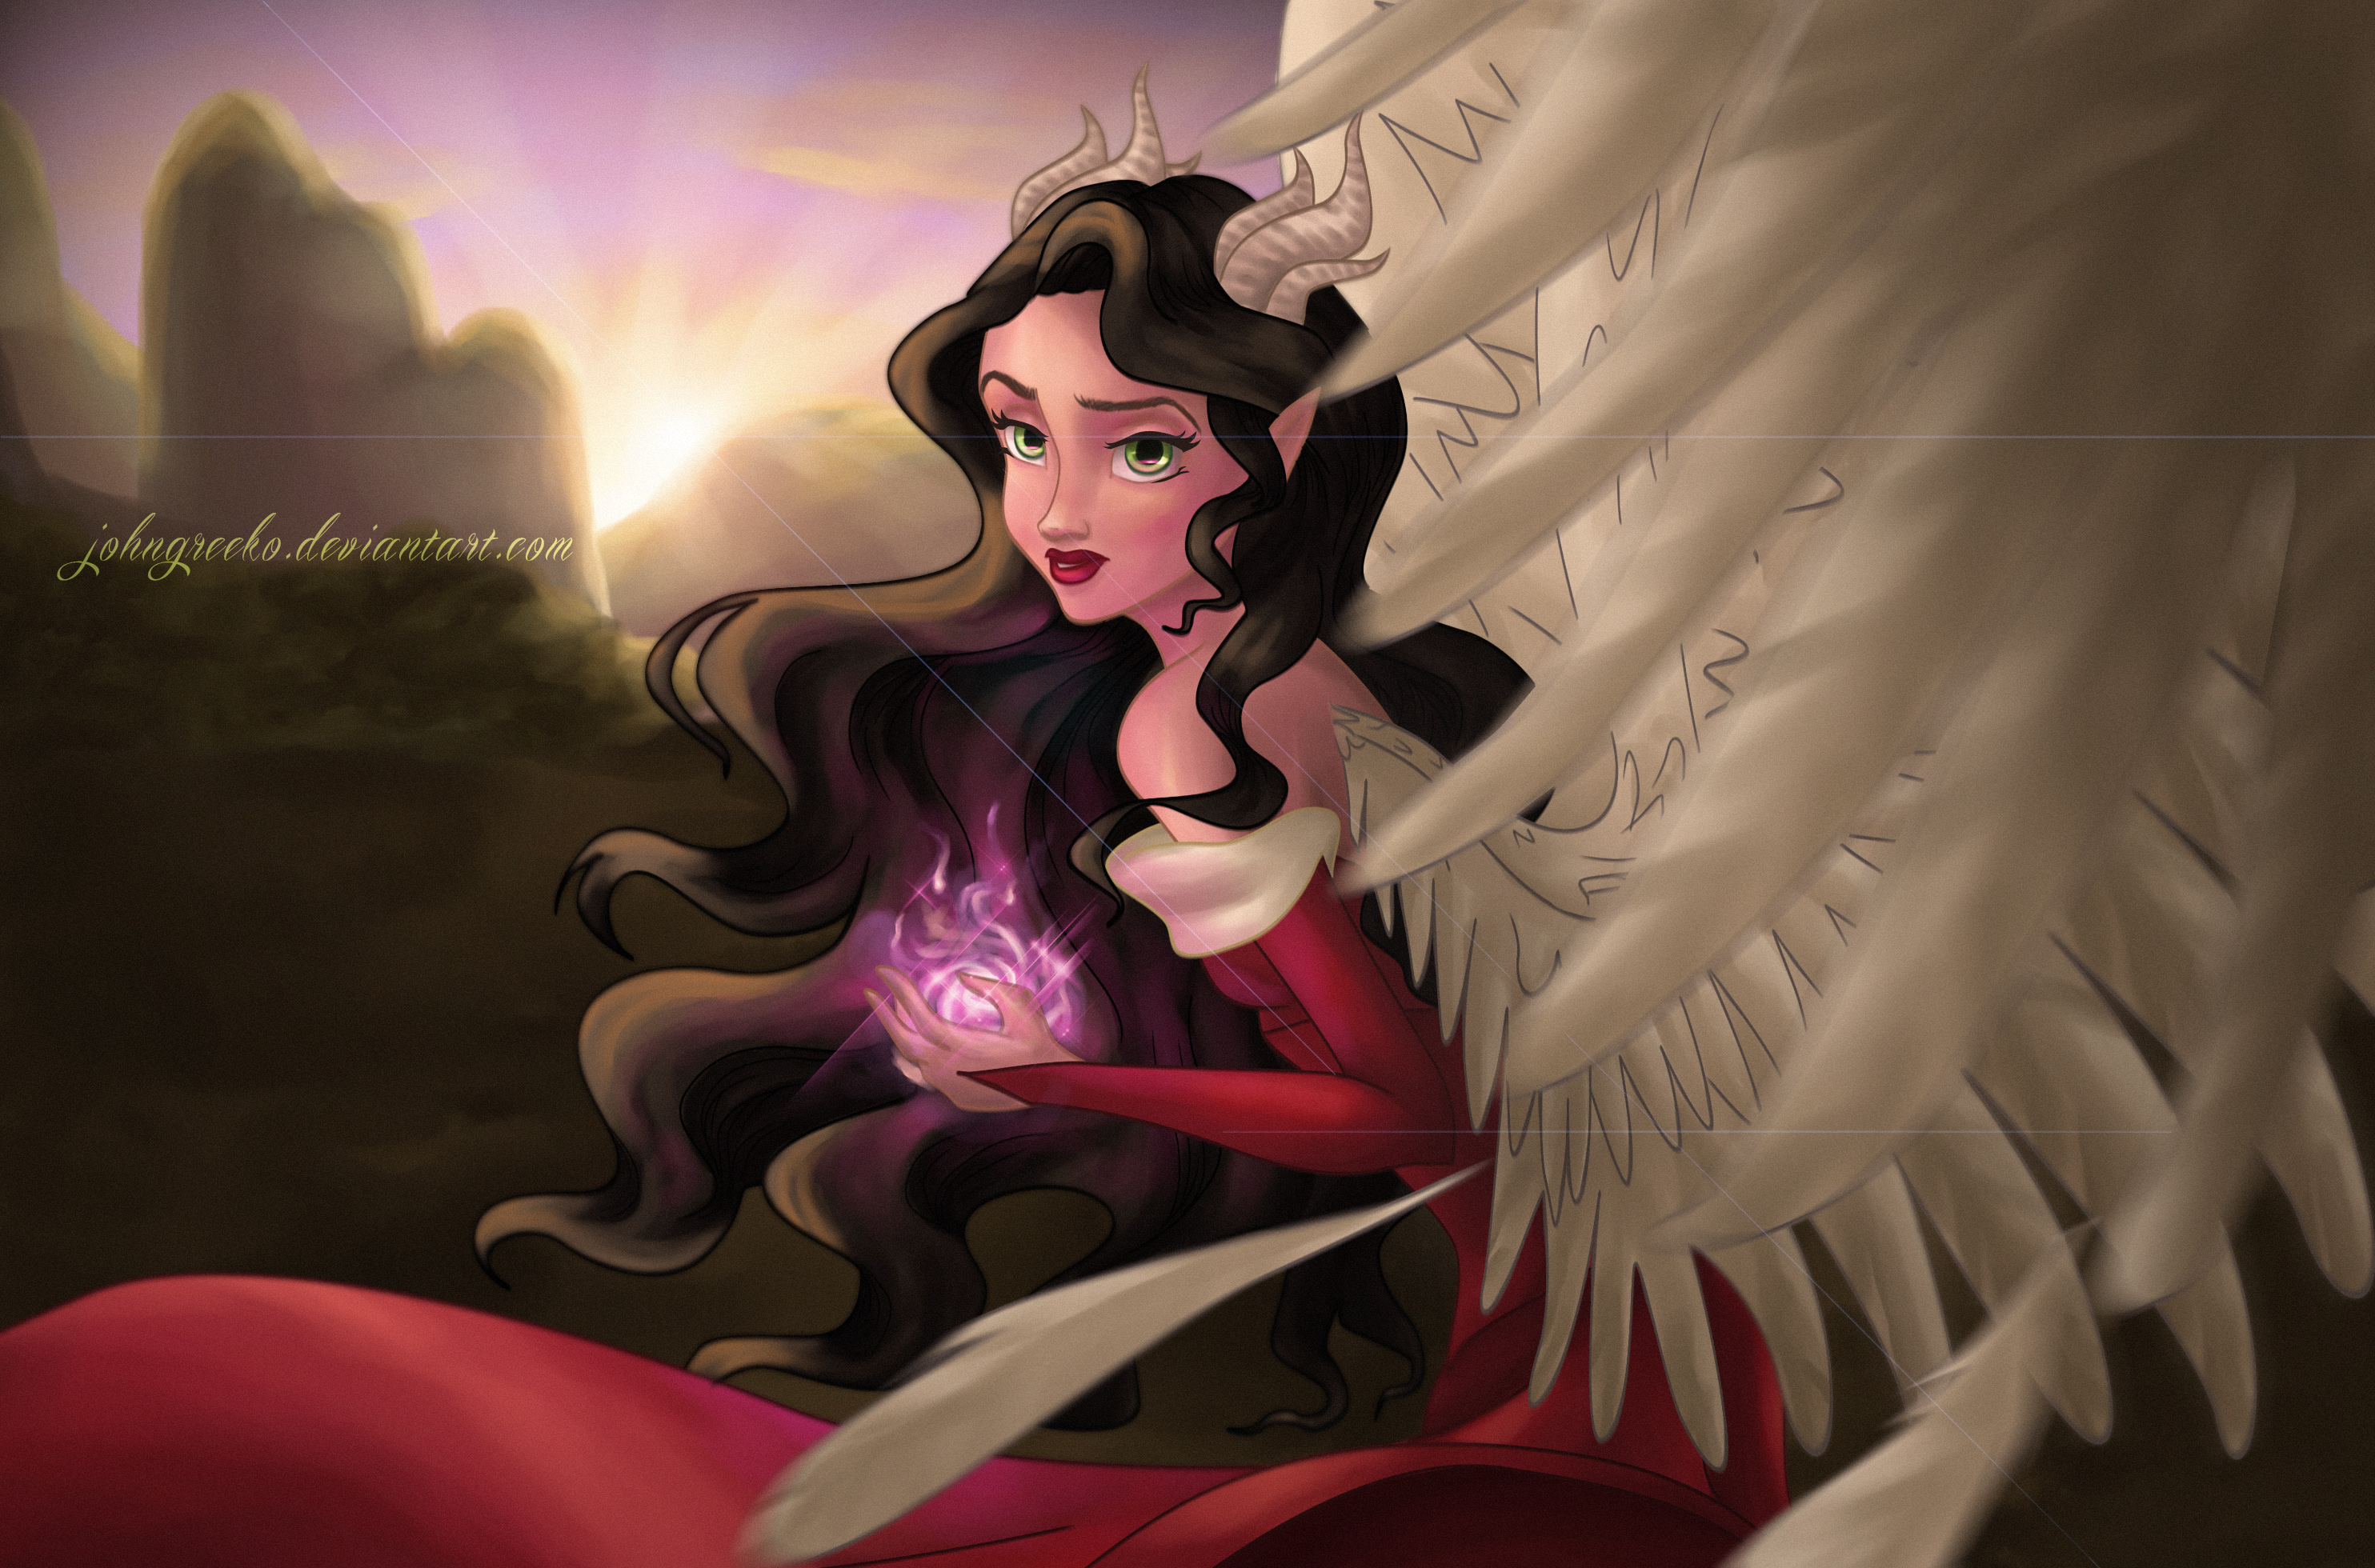 Sinborn Wings: Isabelle 'FREEDOM' by johngreeko